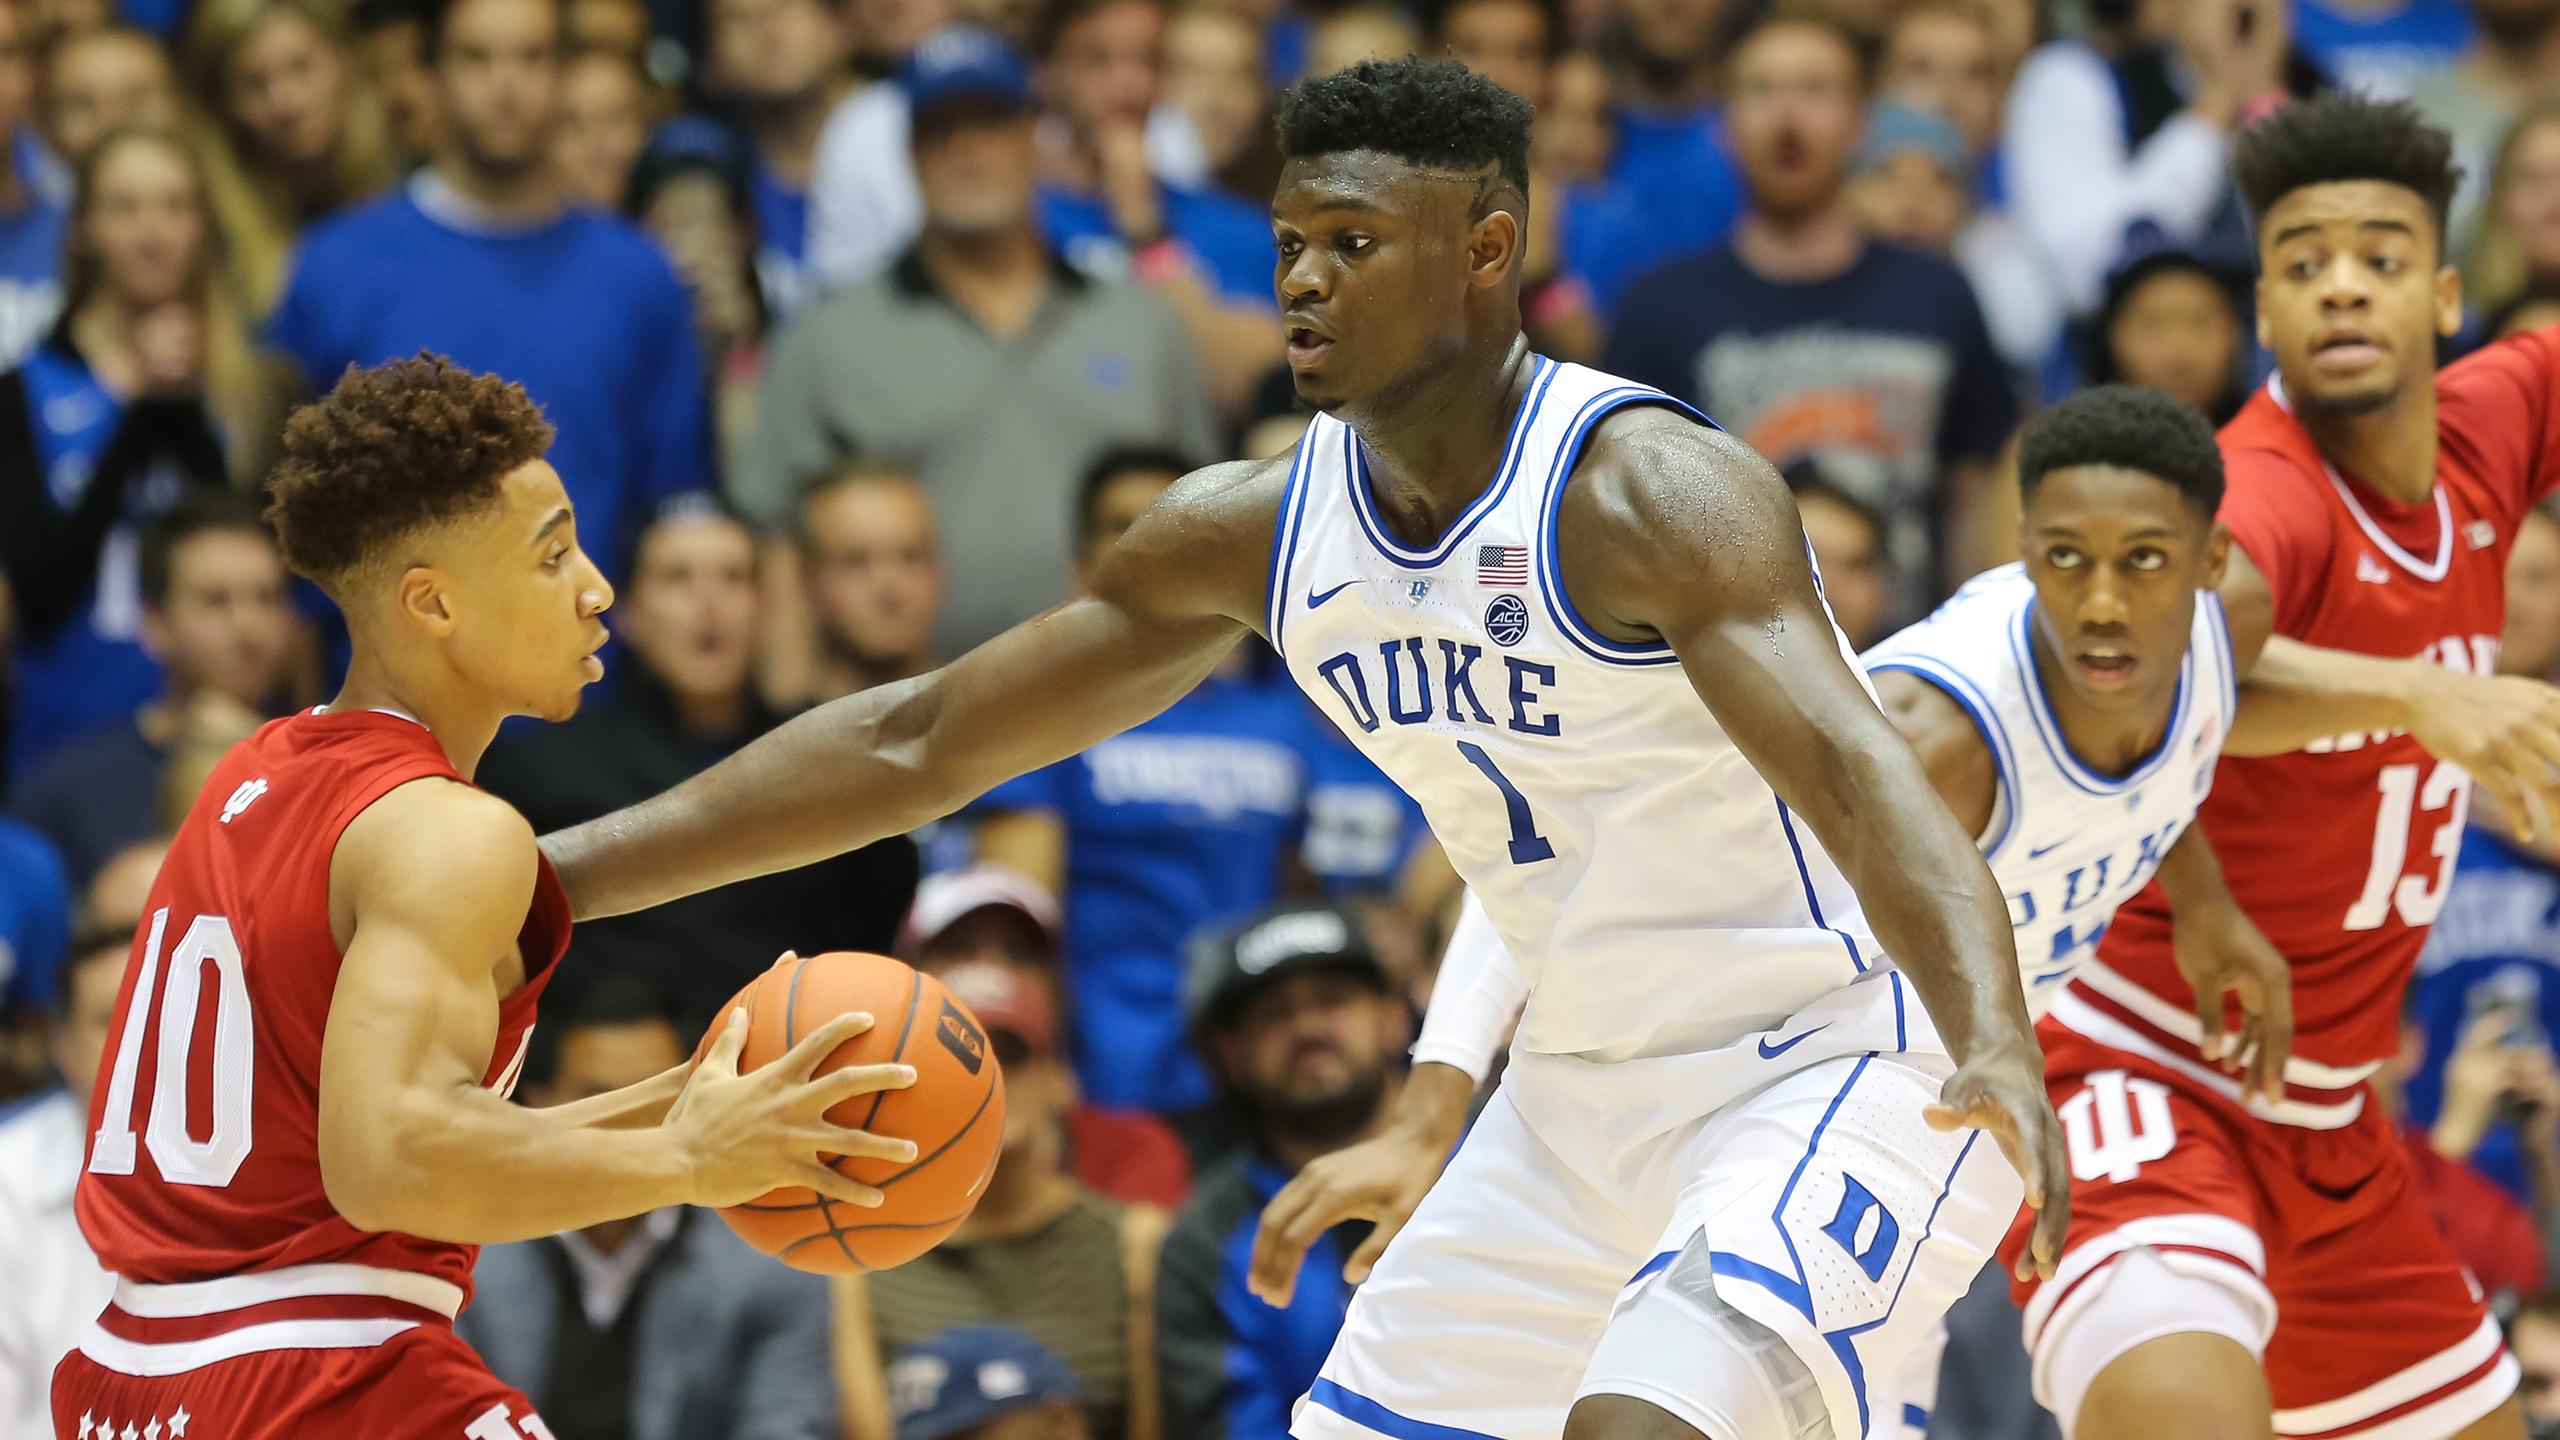 Stetson vs. #3 Duke (M Basketball)